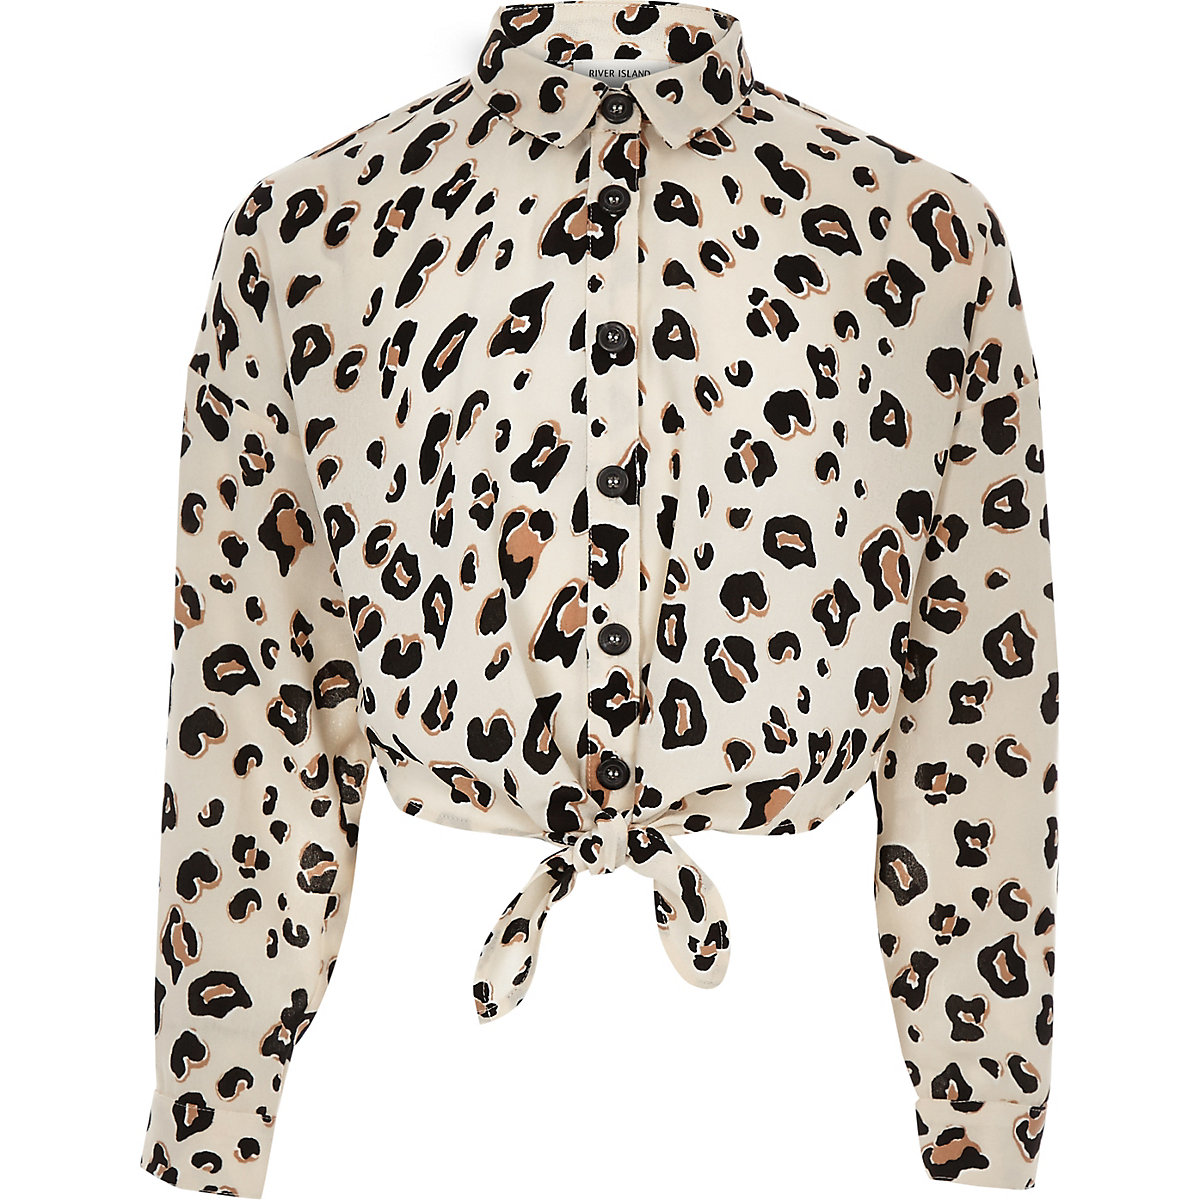 Girls brown leopard print tie front shirt